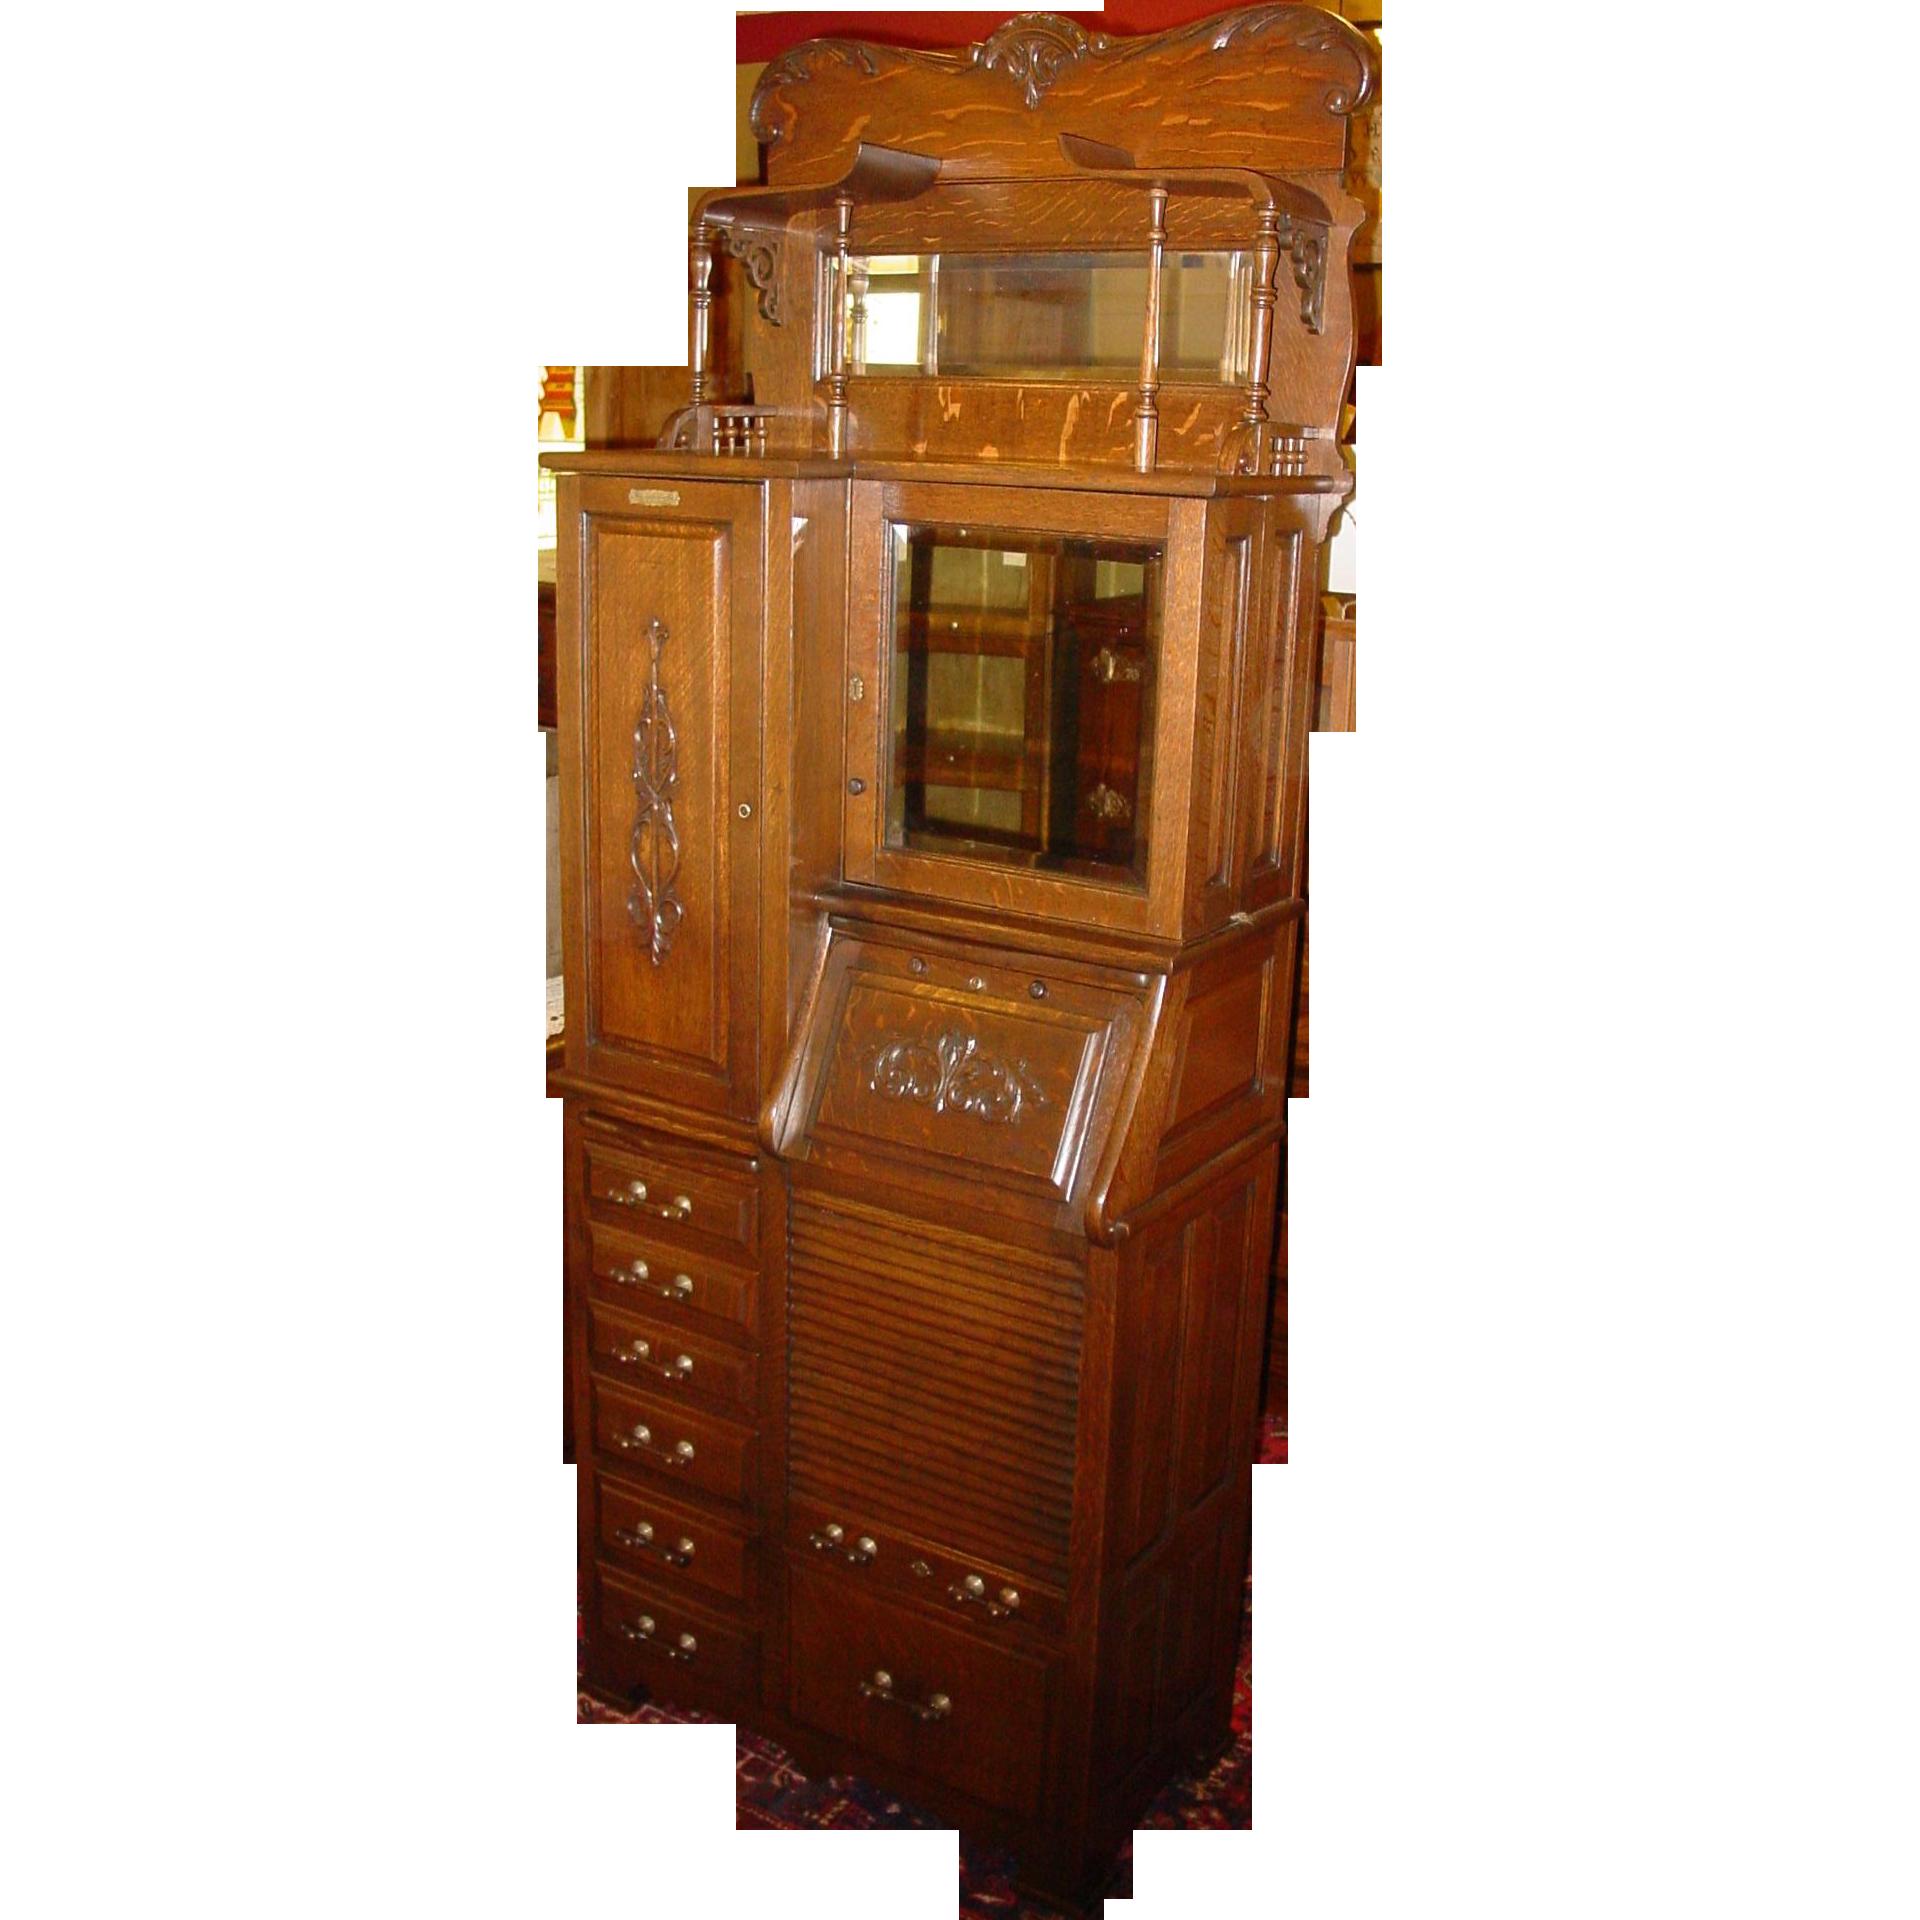 Outstanding quartered oak dental cabinet-Harvard